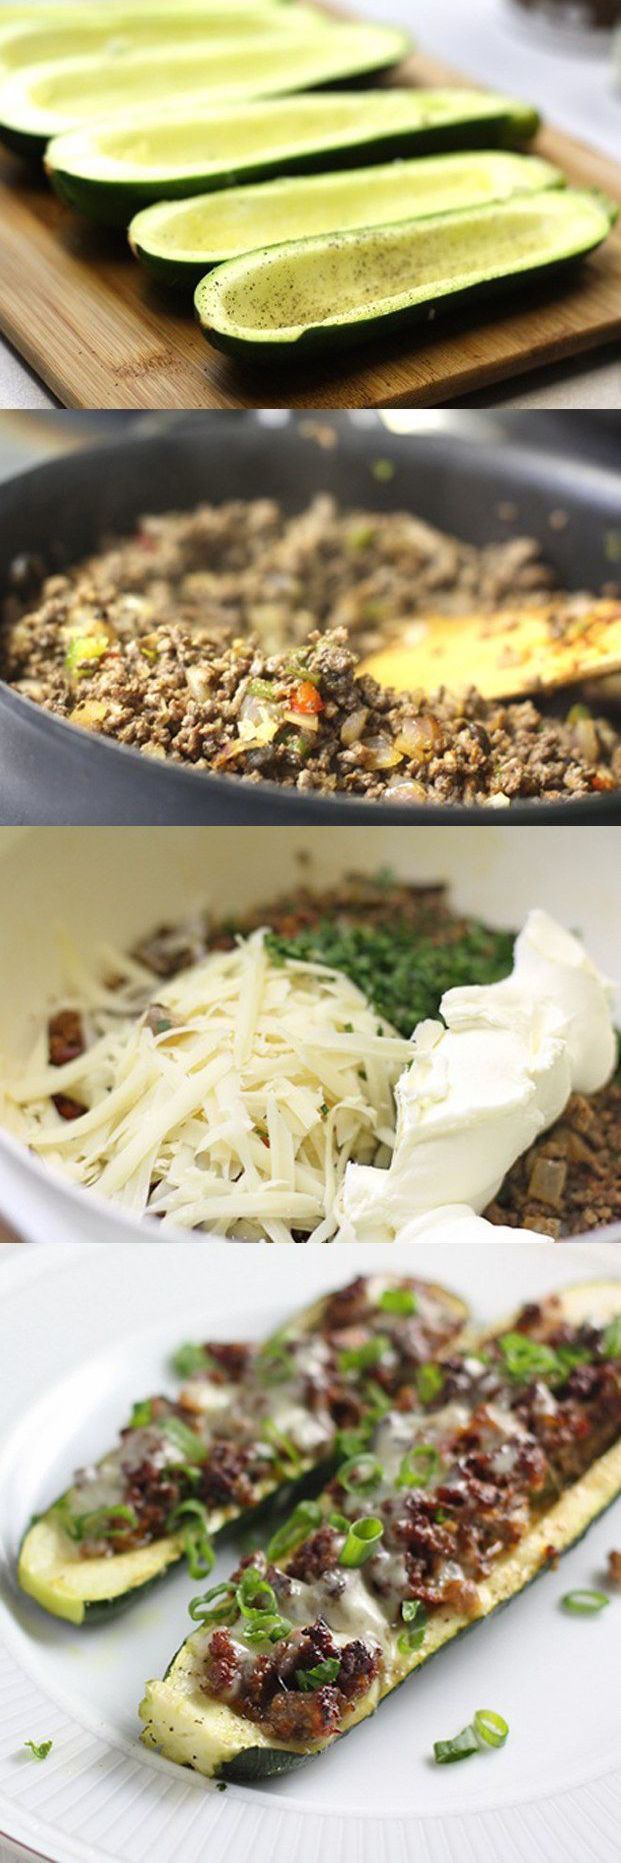 Ground Beef + Cheese Stuffed Zucchini : My Pinterest Recipes